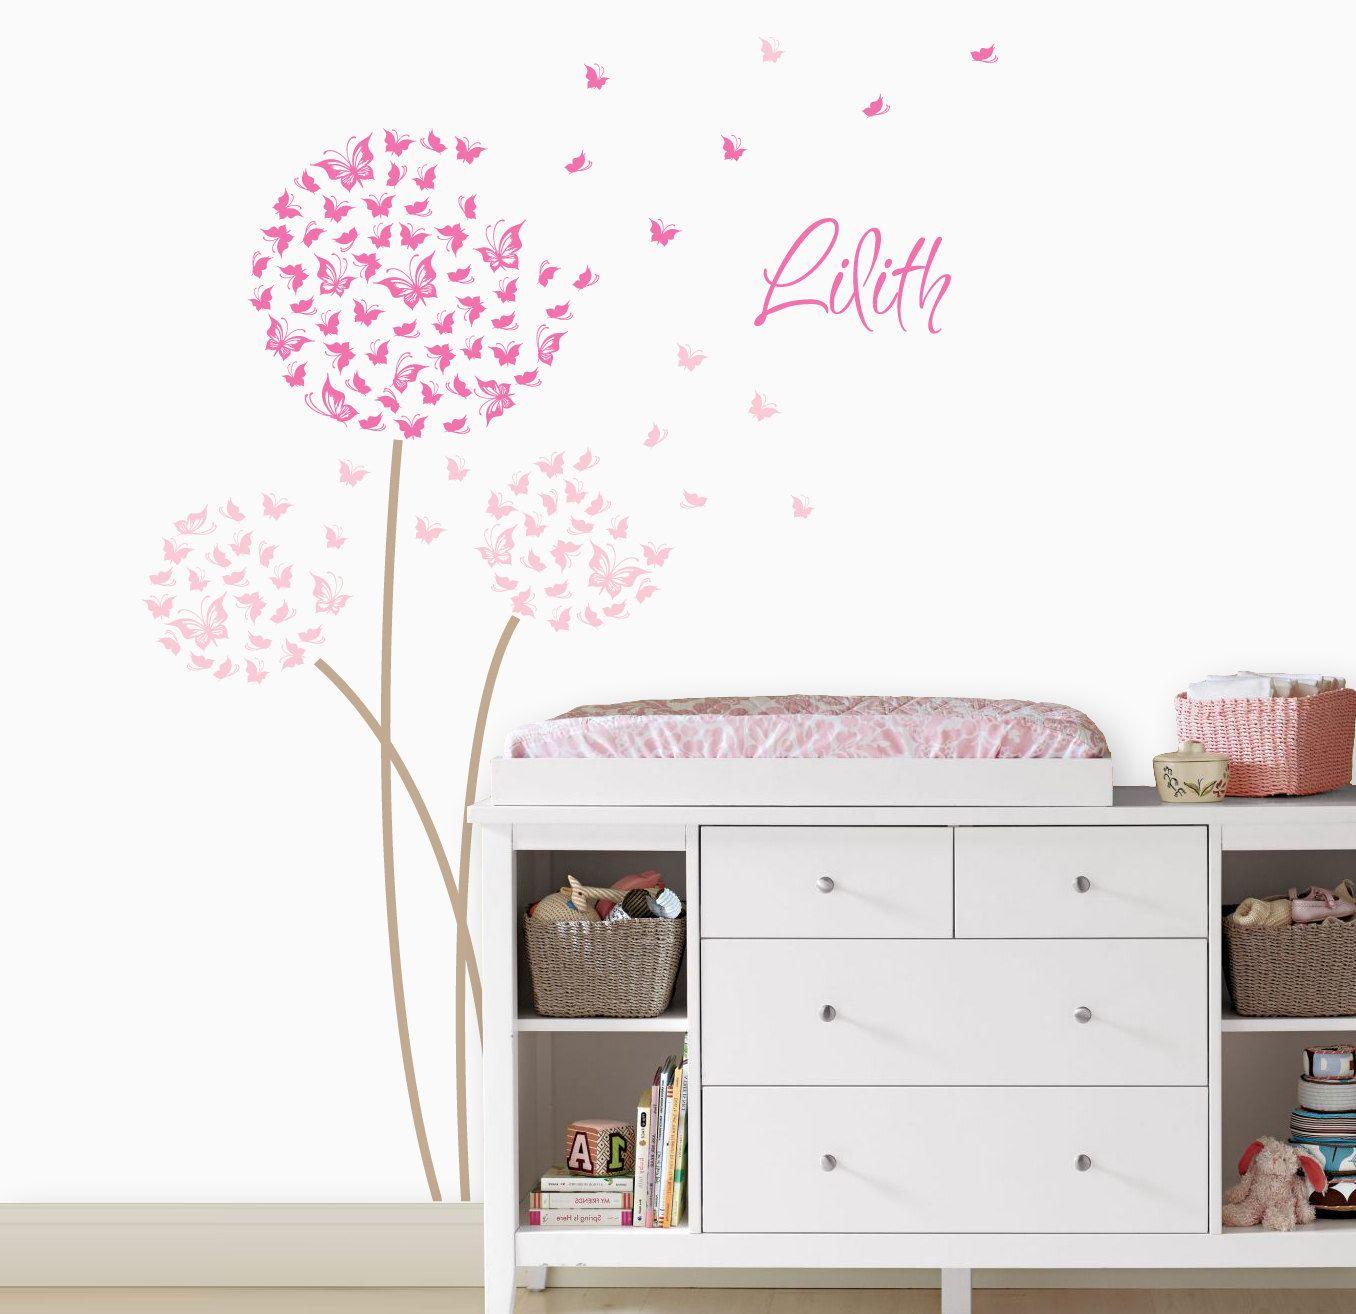 Dandelion Wall Decal | Custom Color With Butterflies | Custom Baby Nursery,  Childrenu0027s Room Interior Design | Easy Squeegee Application 033